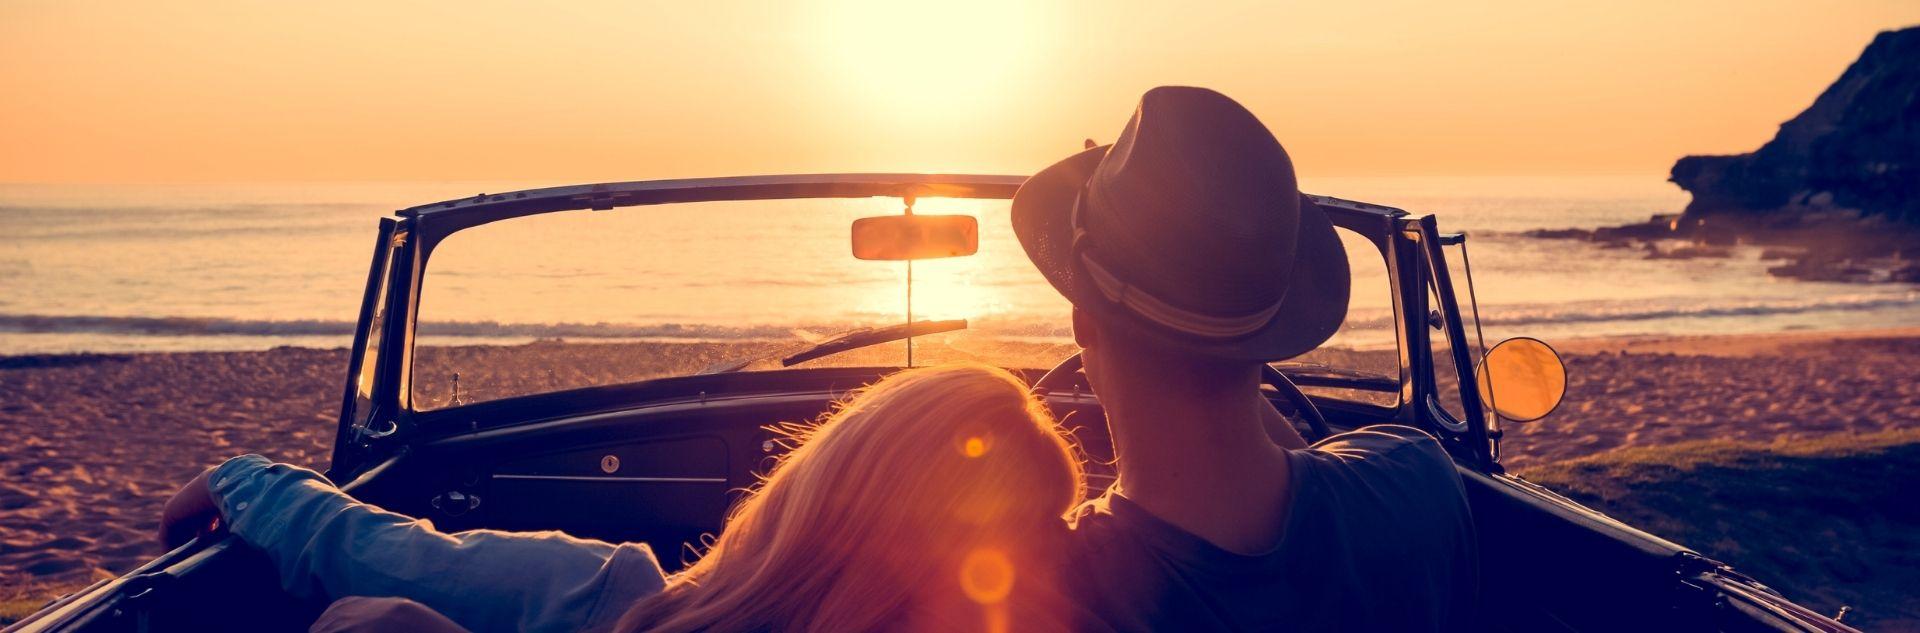 Paar im Auto am Strand